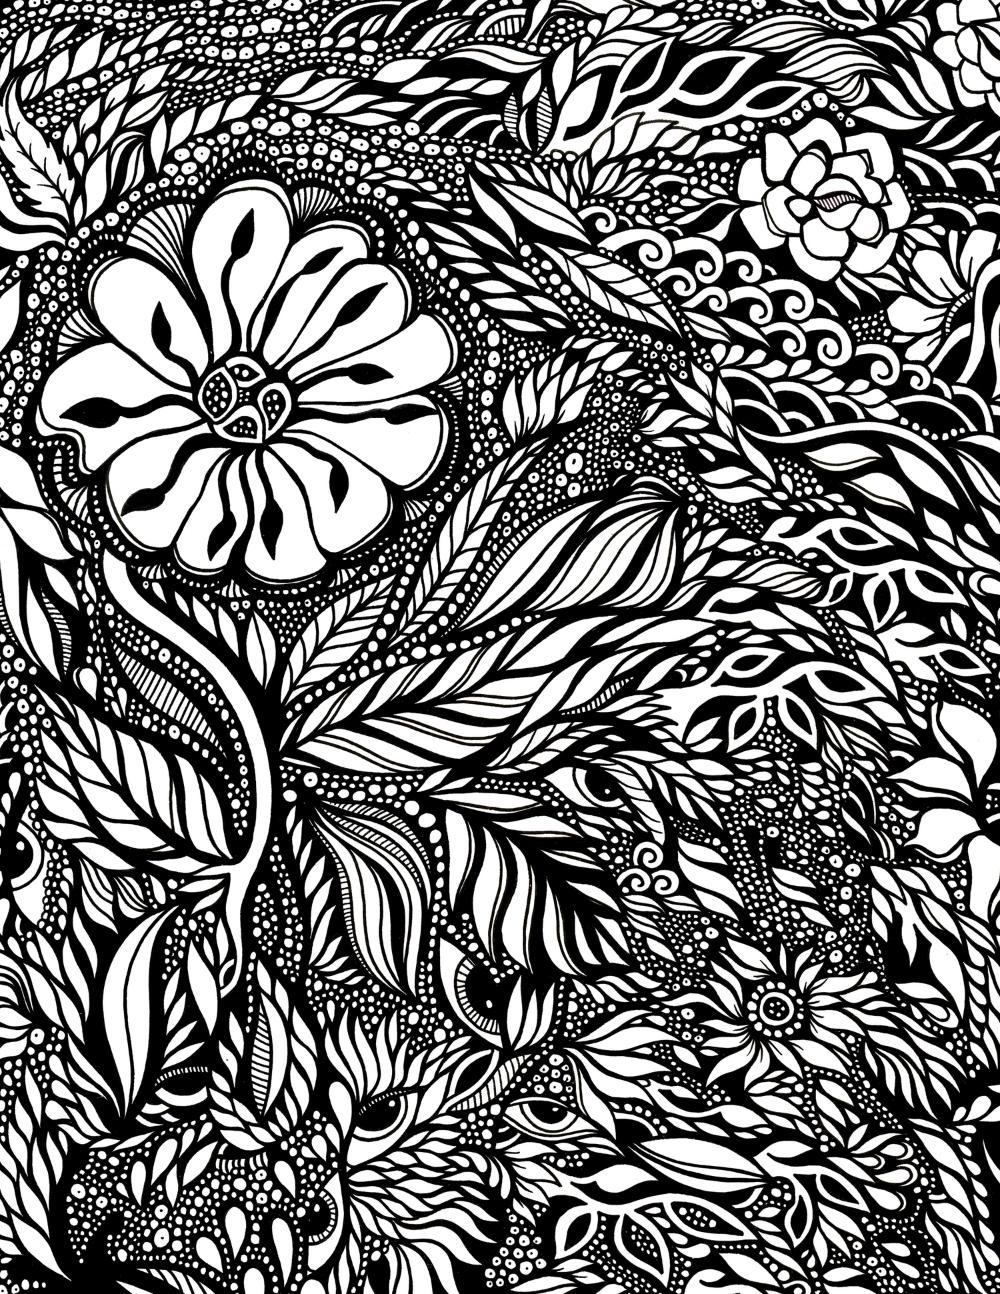 Botanica1_PRINT.jpg